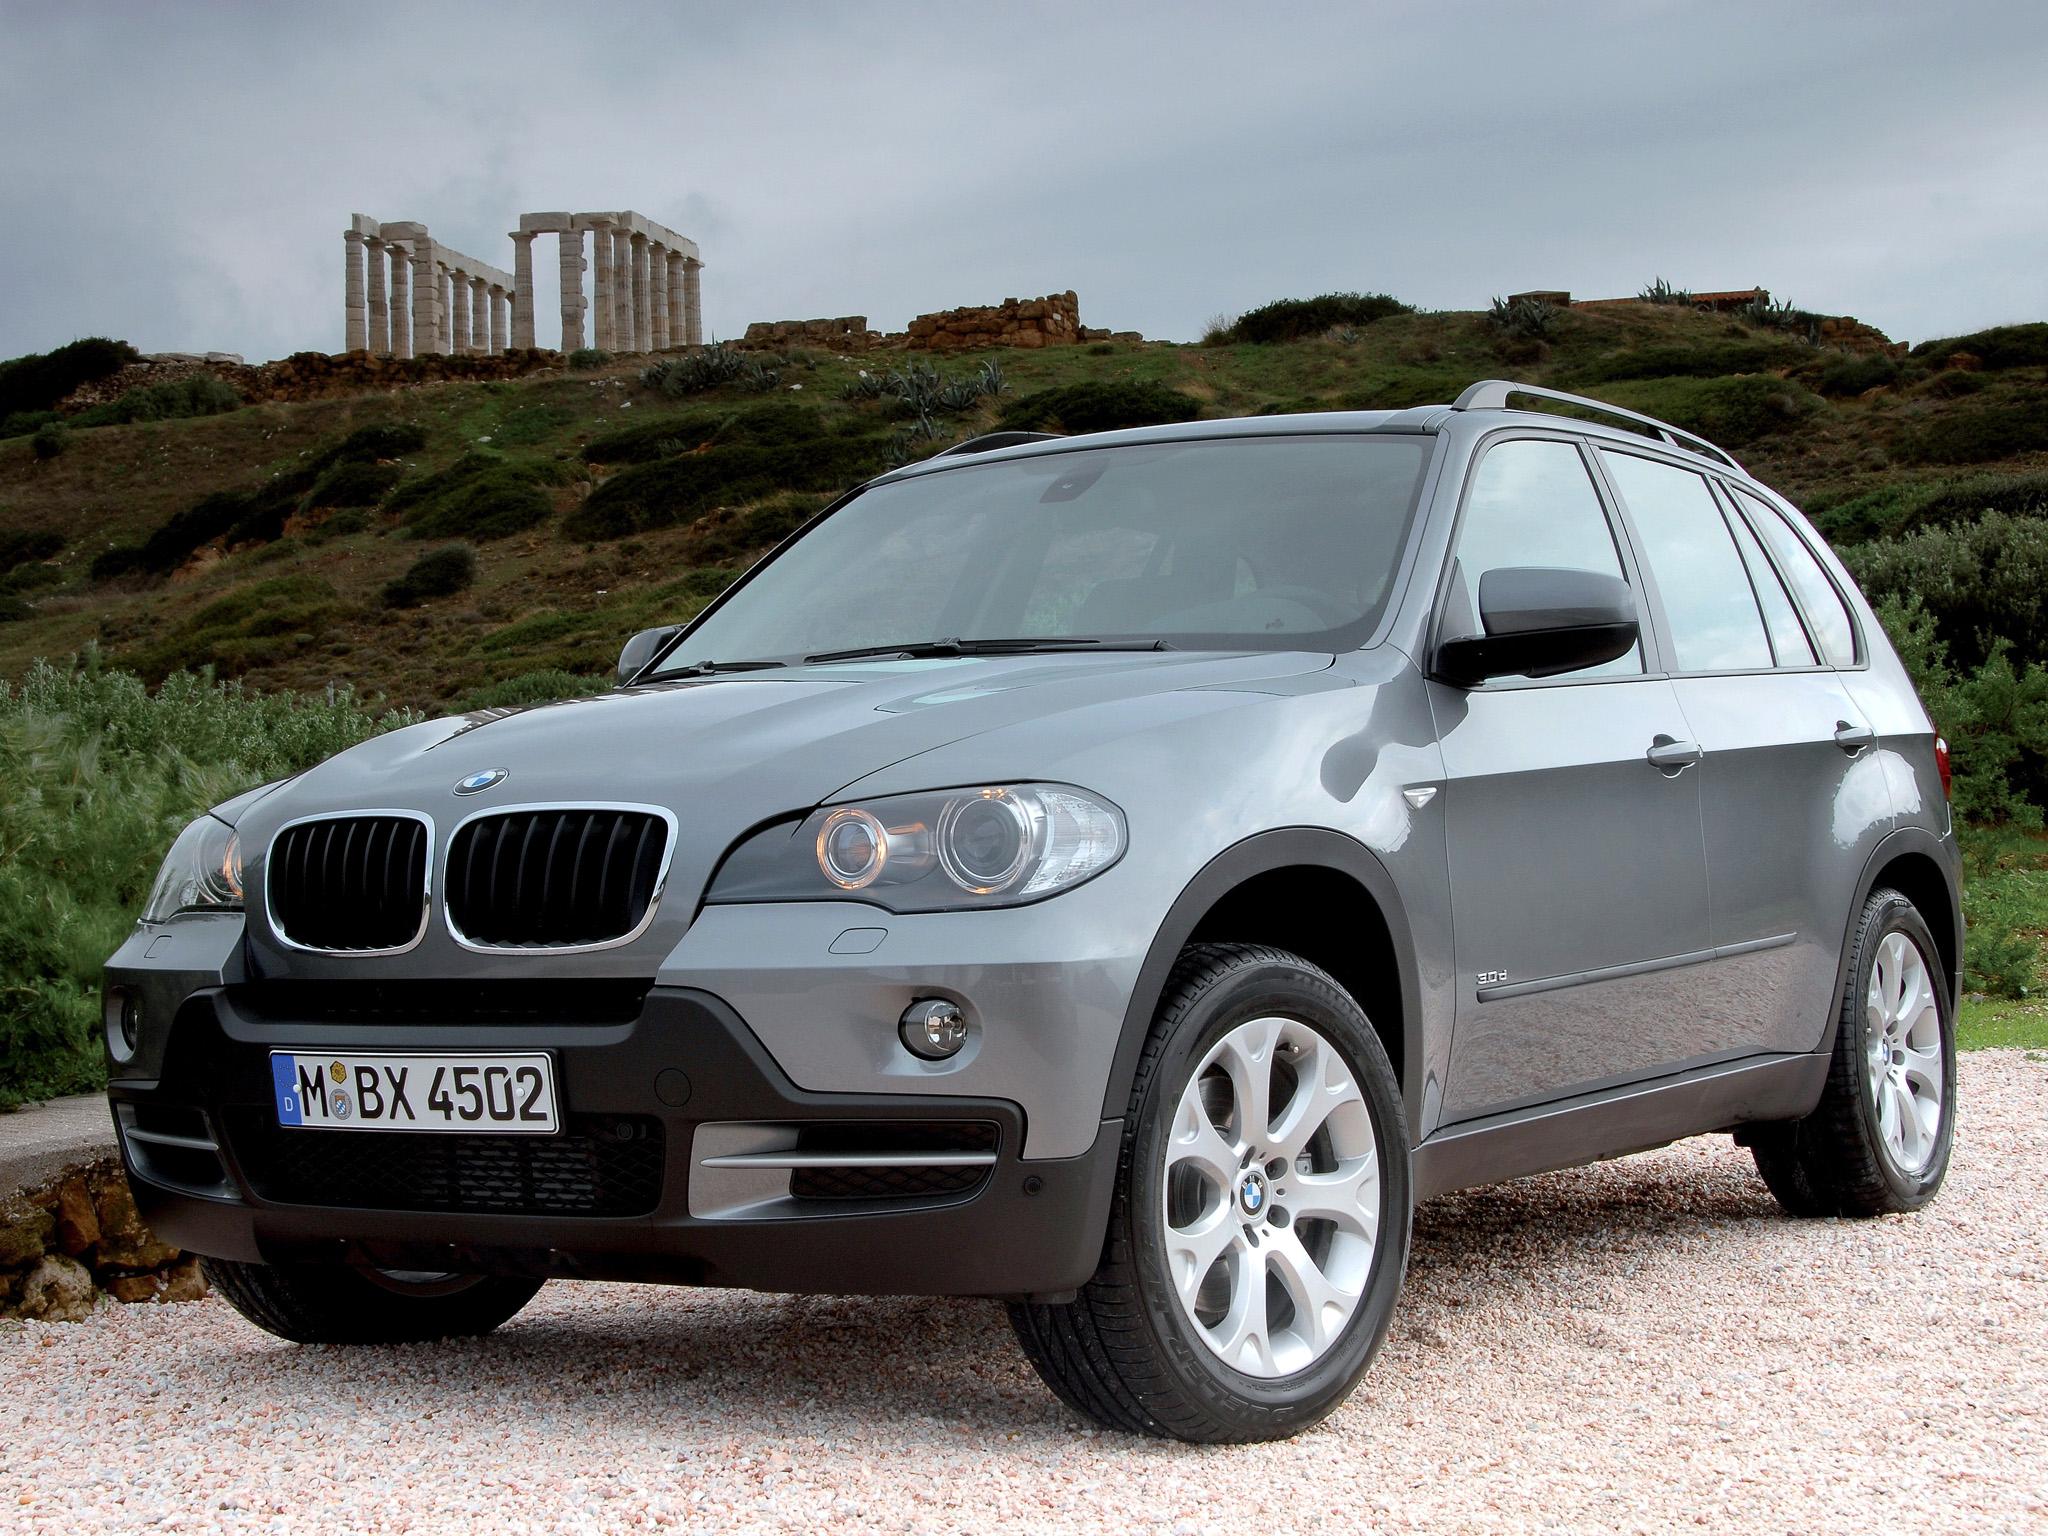 Matiz-club: BMW X5 и X6 встанут под спортивные знамена